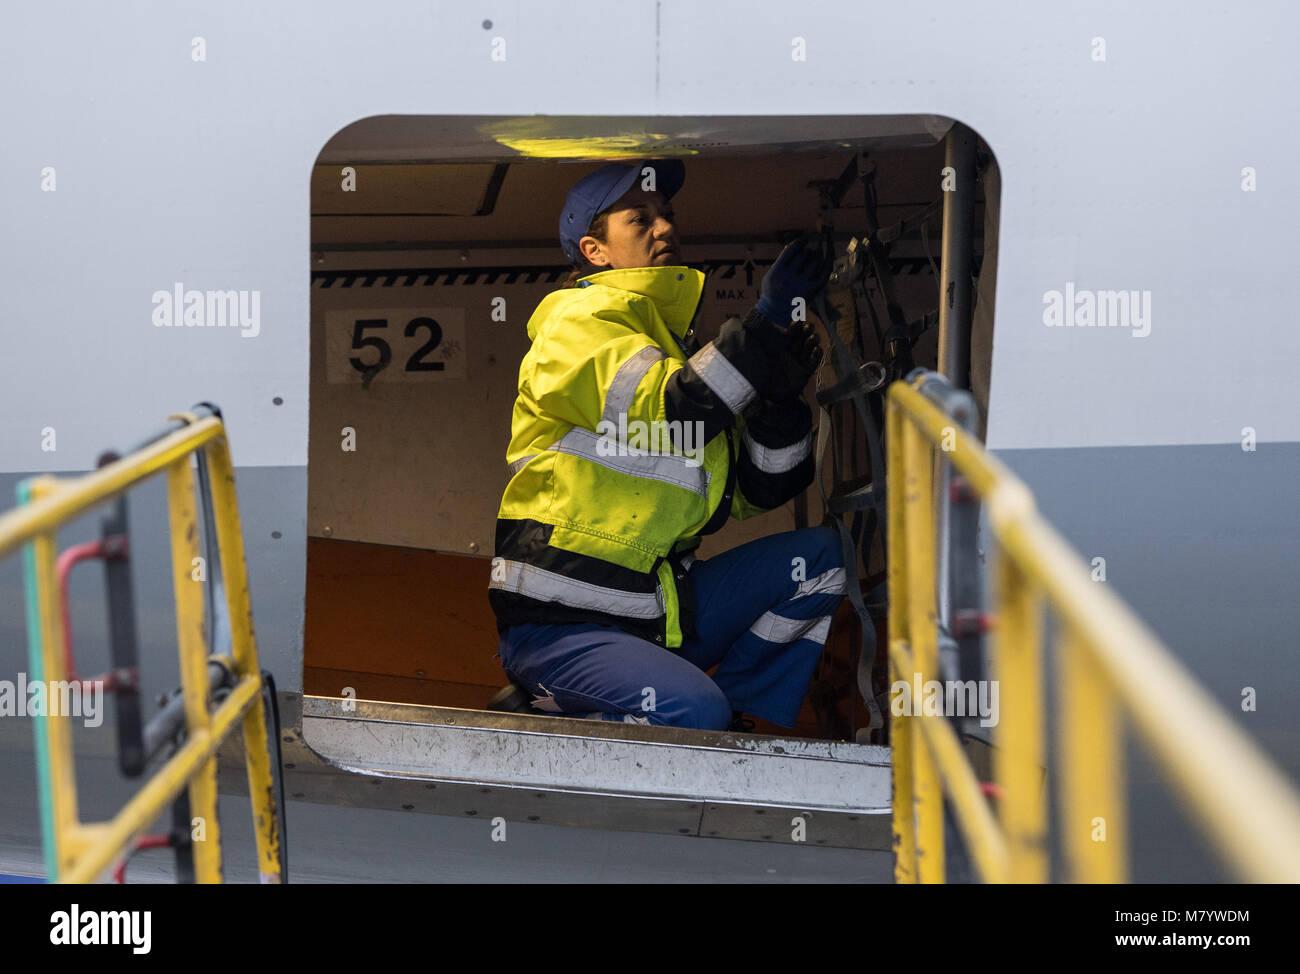 08 March 2018, Germany, Frankfurt: Sevim Sejdijaj, in charge of ground handling operations,  kneels inside - Stock Image